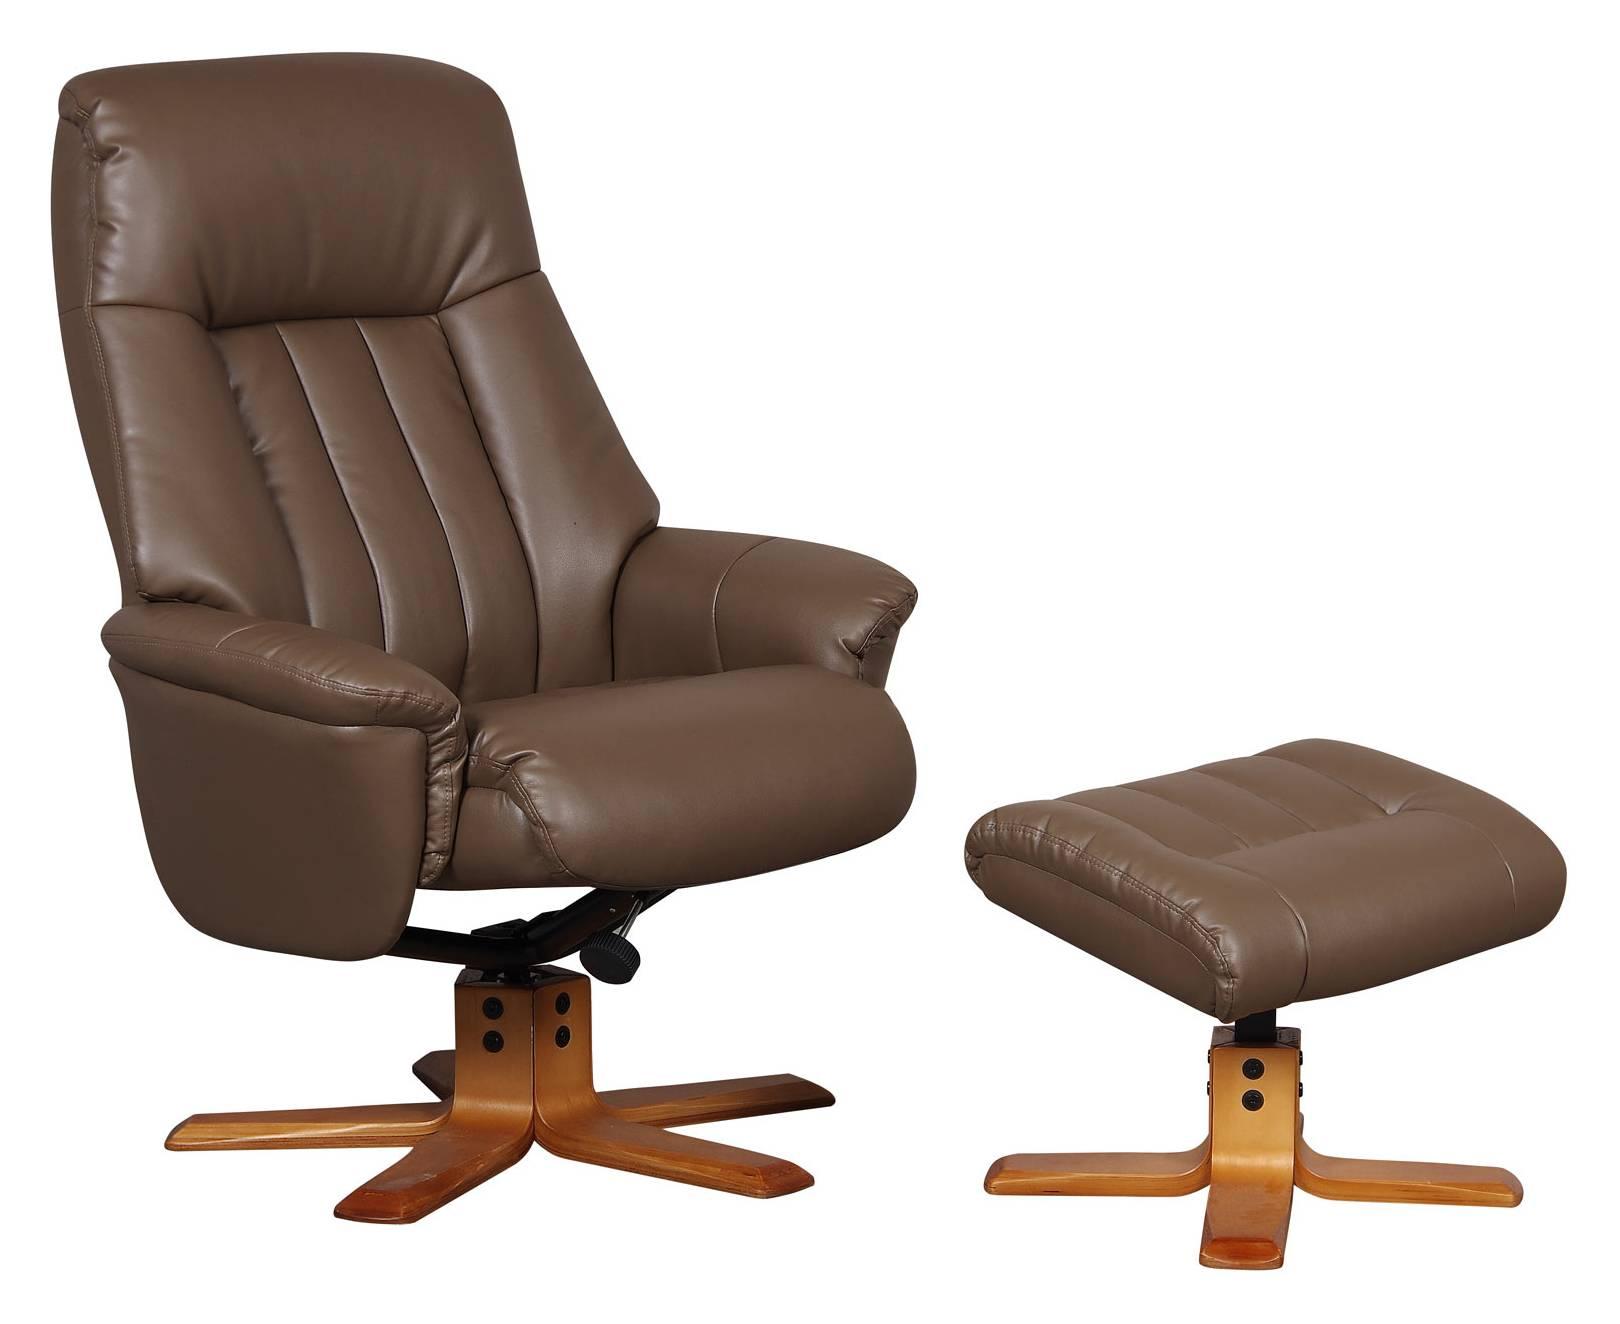 Tremendous Toledo Swivel Recliner Footstool Creativecarmelina Interior Chair Design Creativecarmelinacom